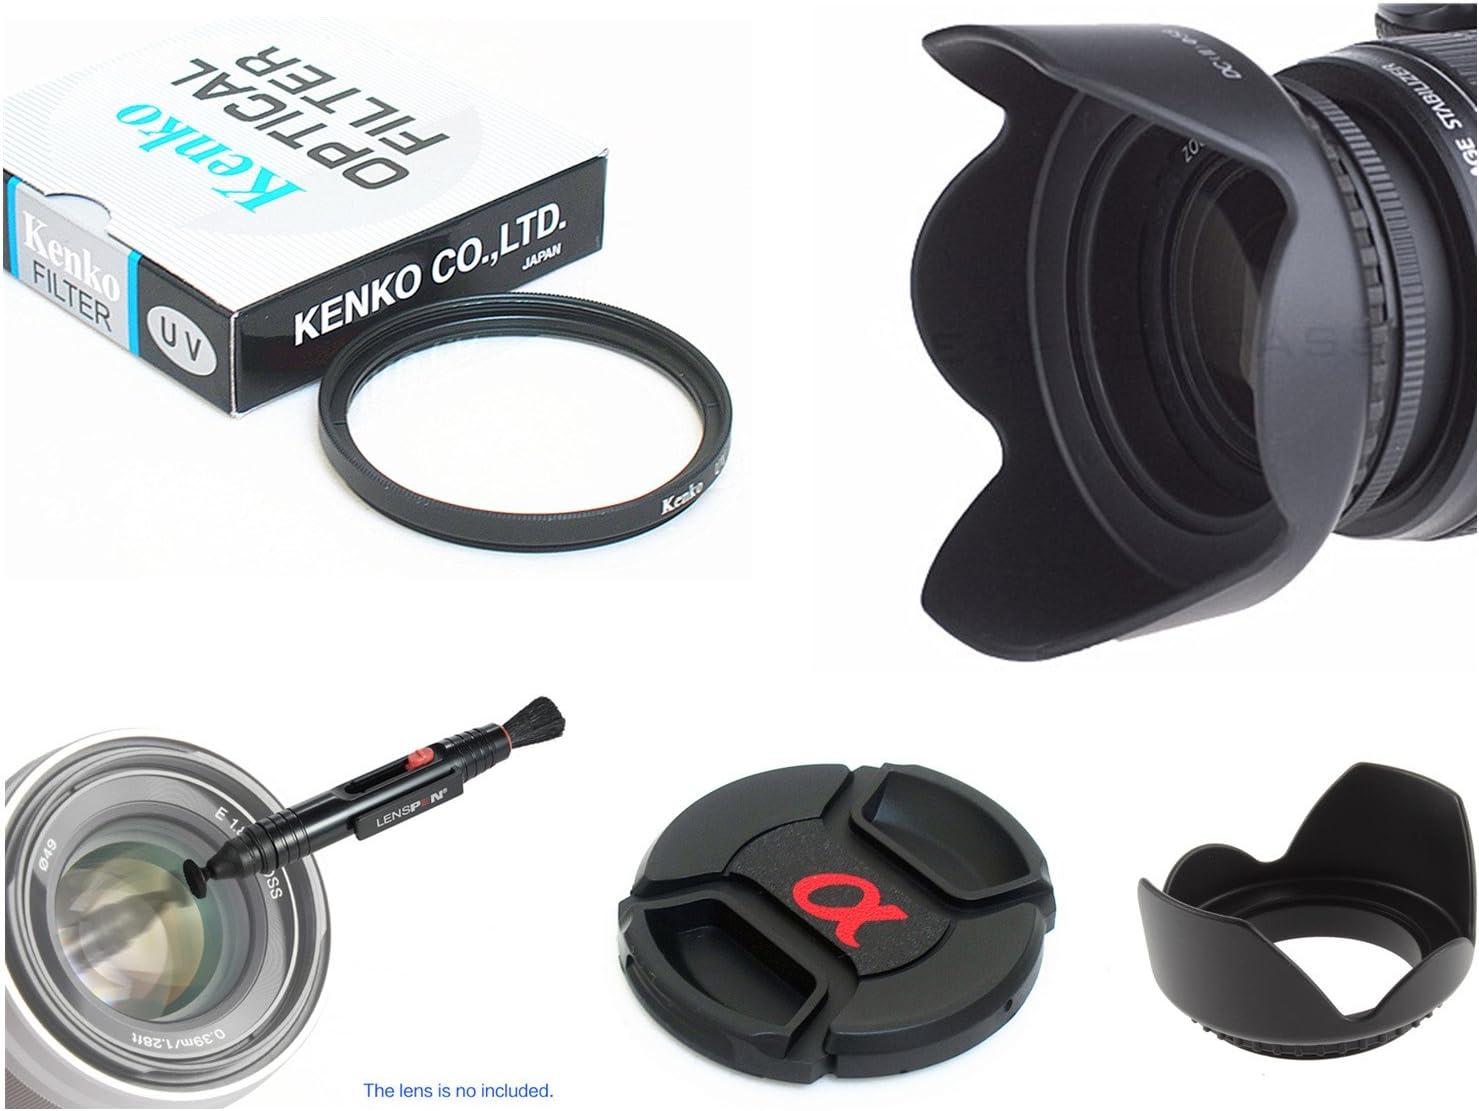 ACMAXX Multi-Coated Lens Armor UV Filter for Sony Cyber-Shot DSC-HX350 Camera